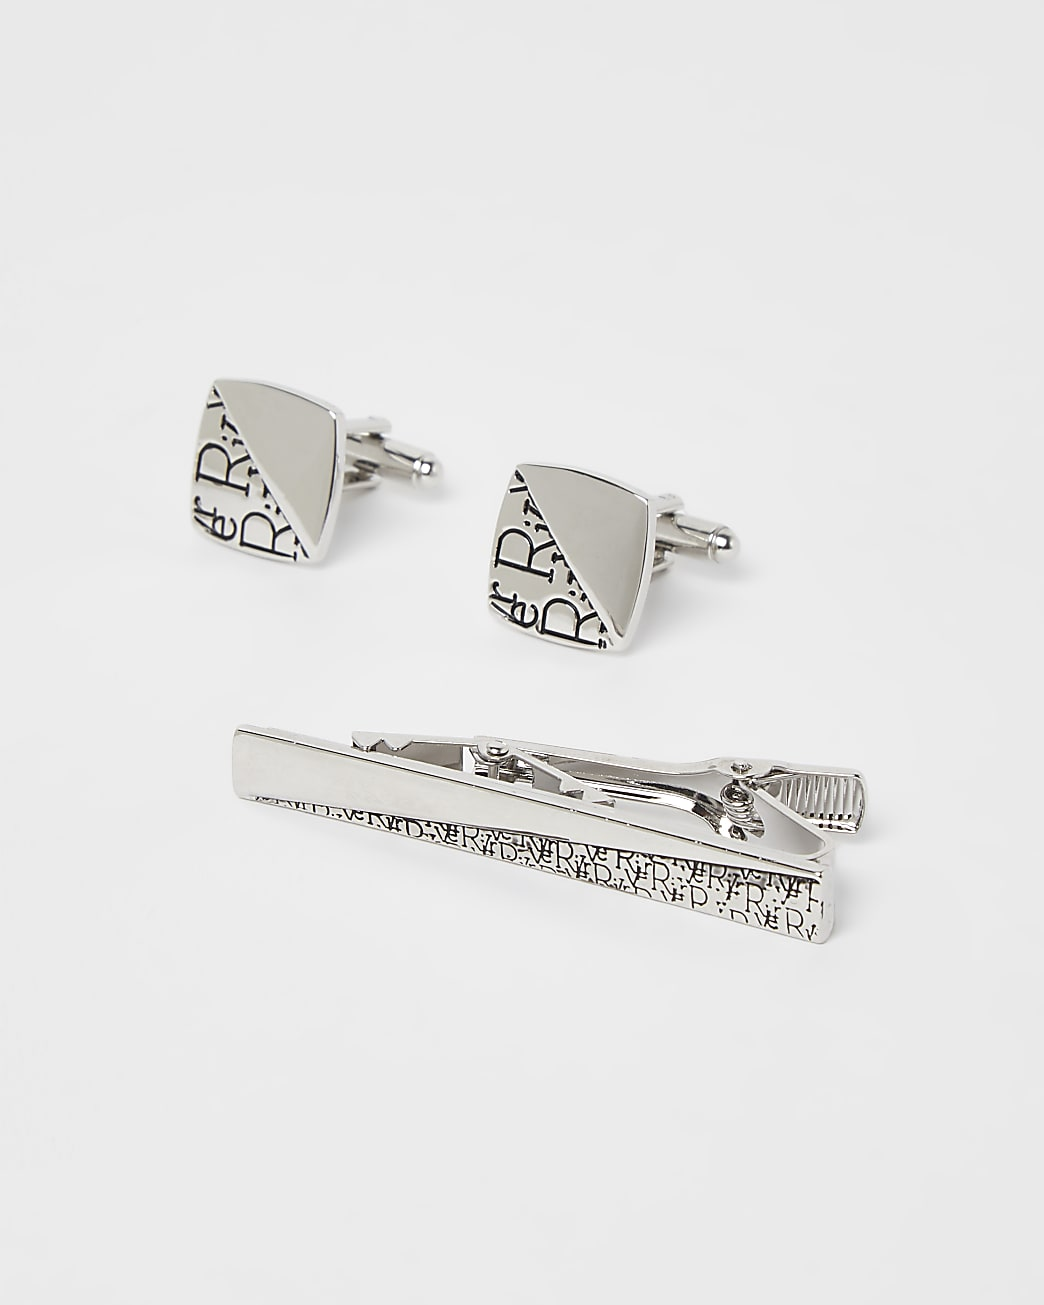 Silver RI monogram tie pin and cufflinks set